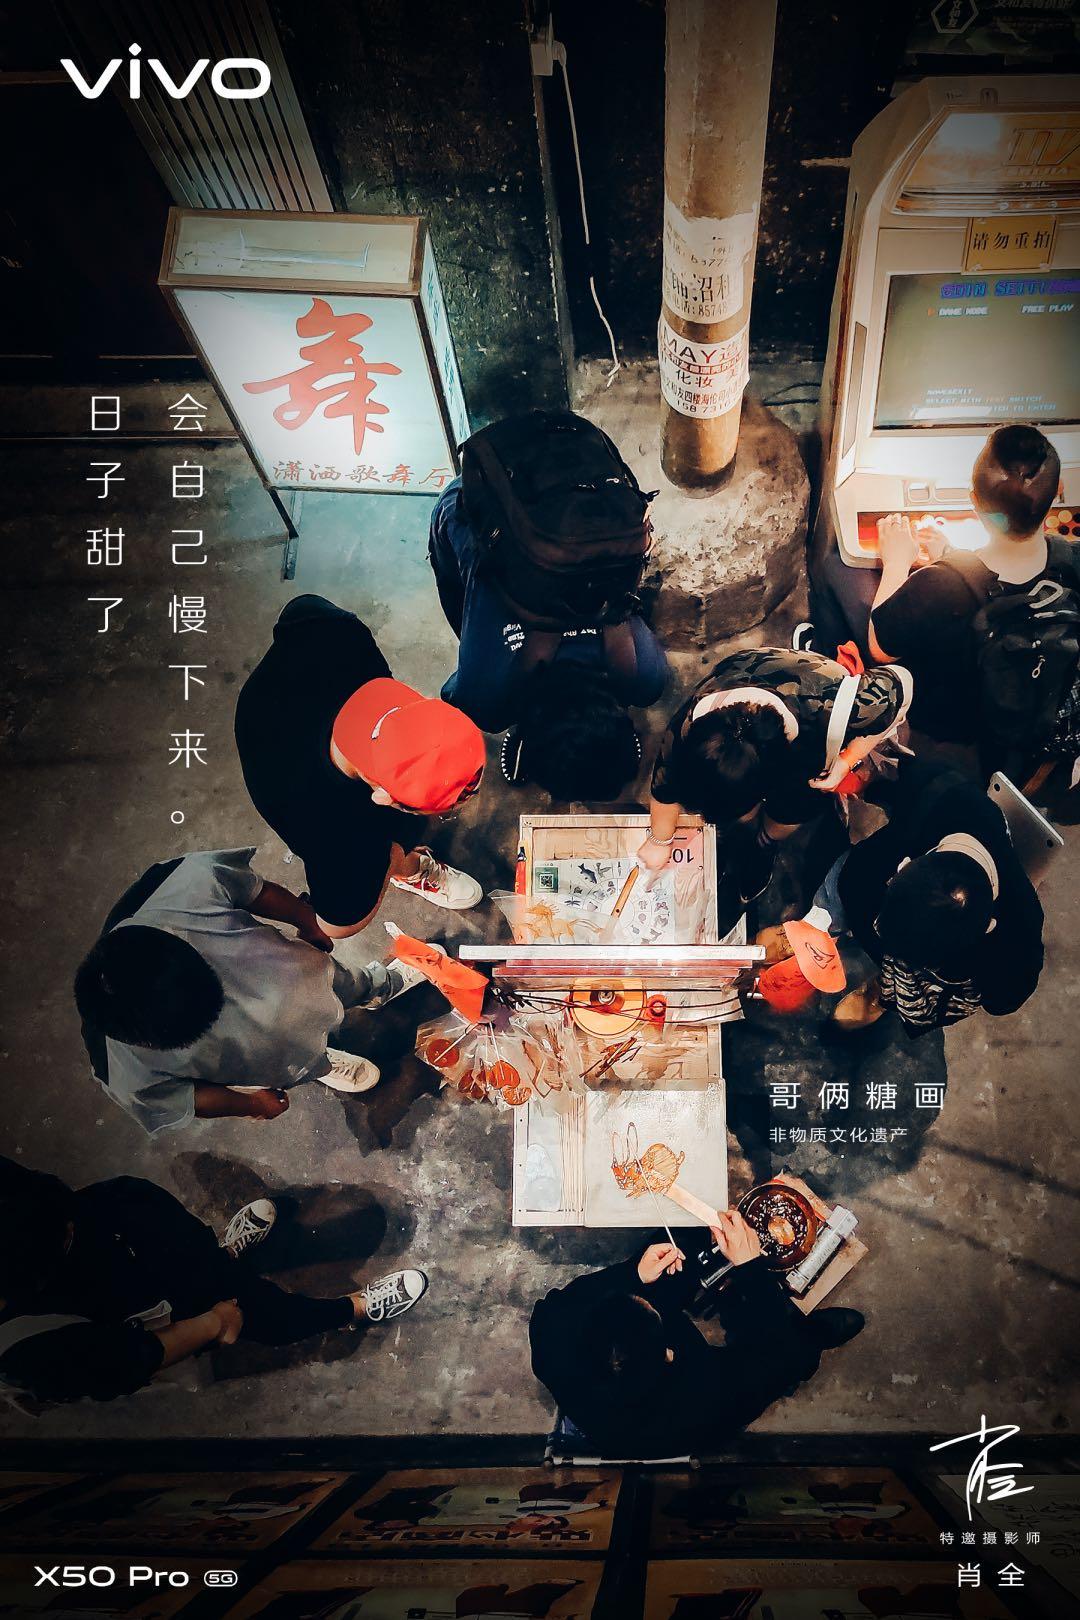 vivoX50pro拍摄城市夜生活缩影